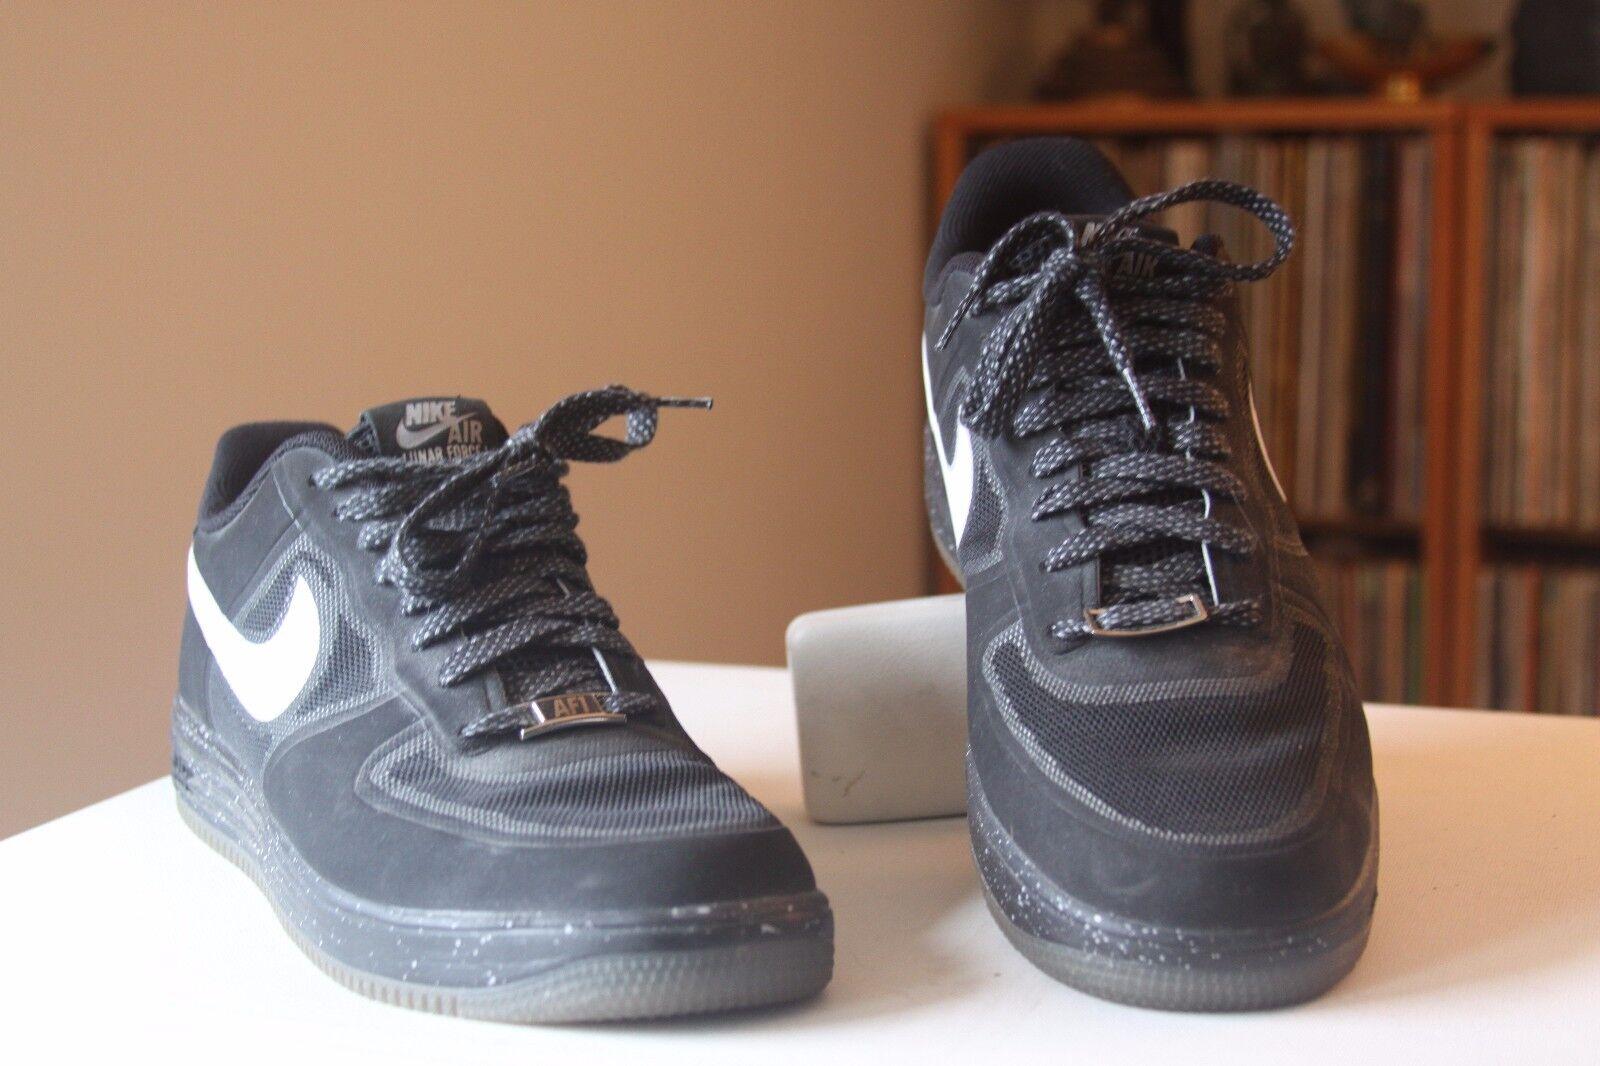 Nike Basketball 555027-010 Lunar Force 1 Fuse Black Leather Basketball Nike Shoes Men's Size 10 abe900